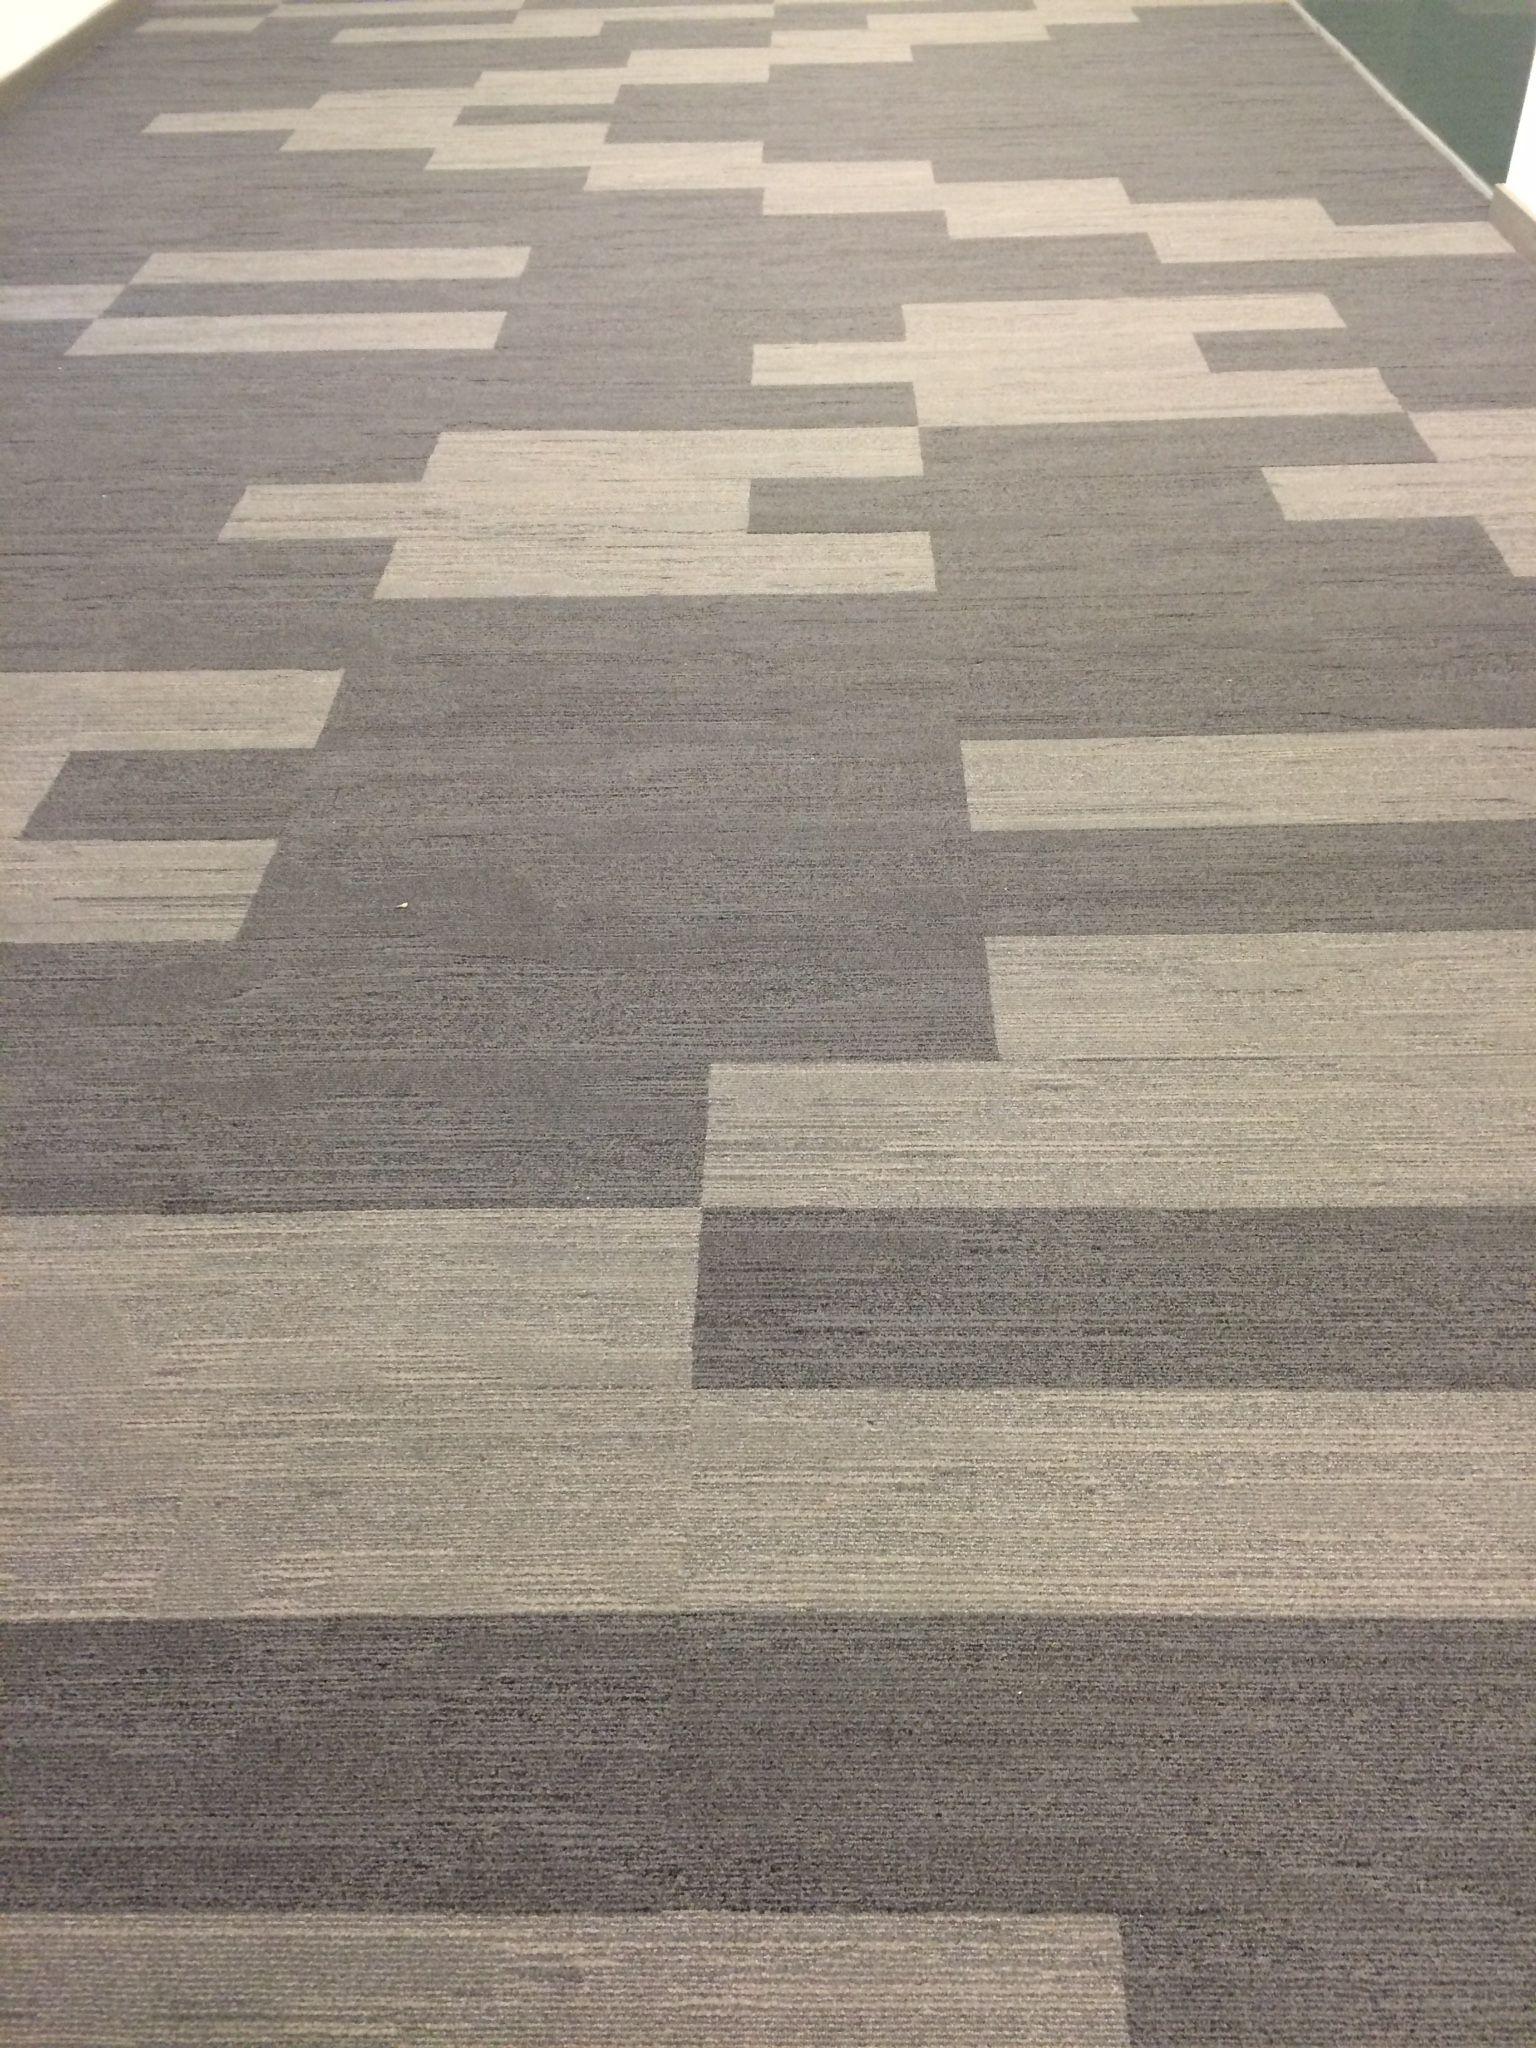 Installation of interface urban retreat carpet tile planks installation of interface urban retreat carpet tile planks baanklon Choice Image